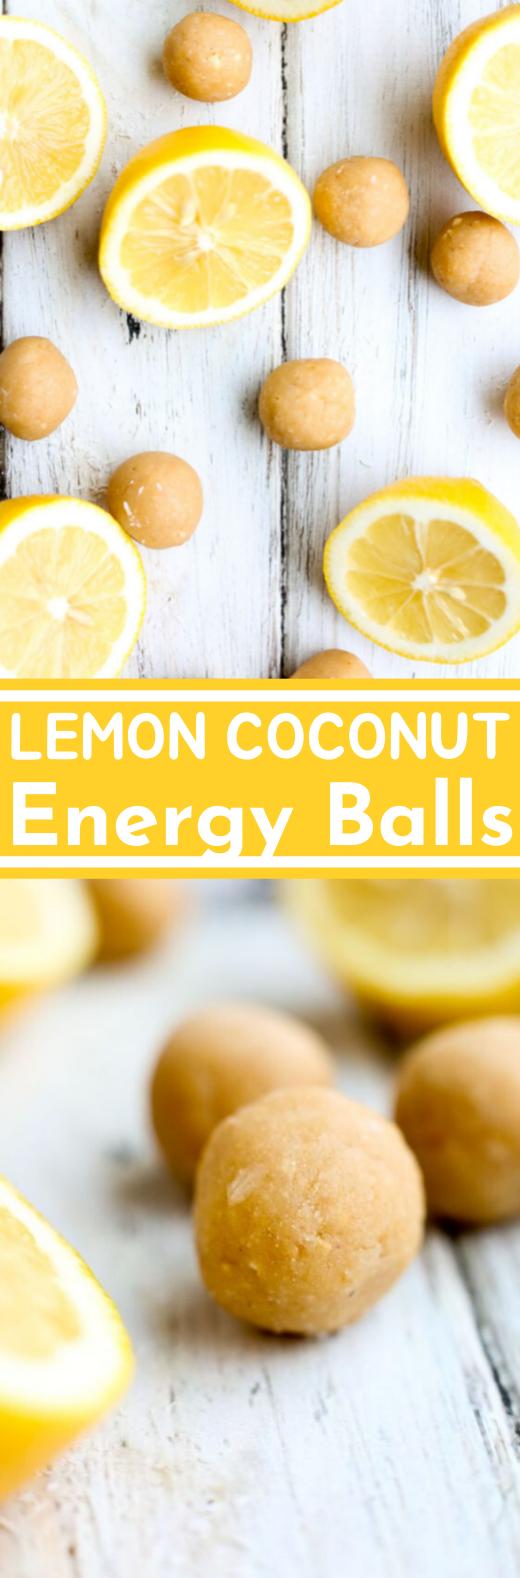 Lemon Coconut Energy Balls #healthy #recipe #snacks #breakfast #diet